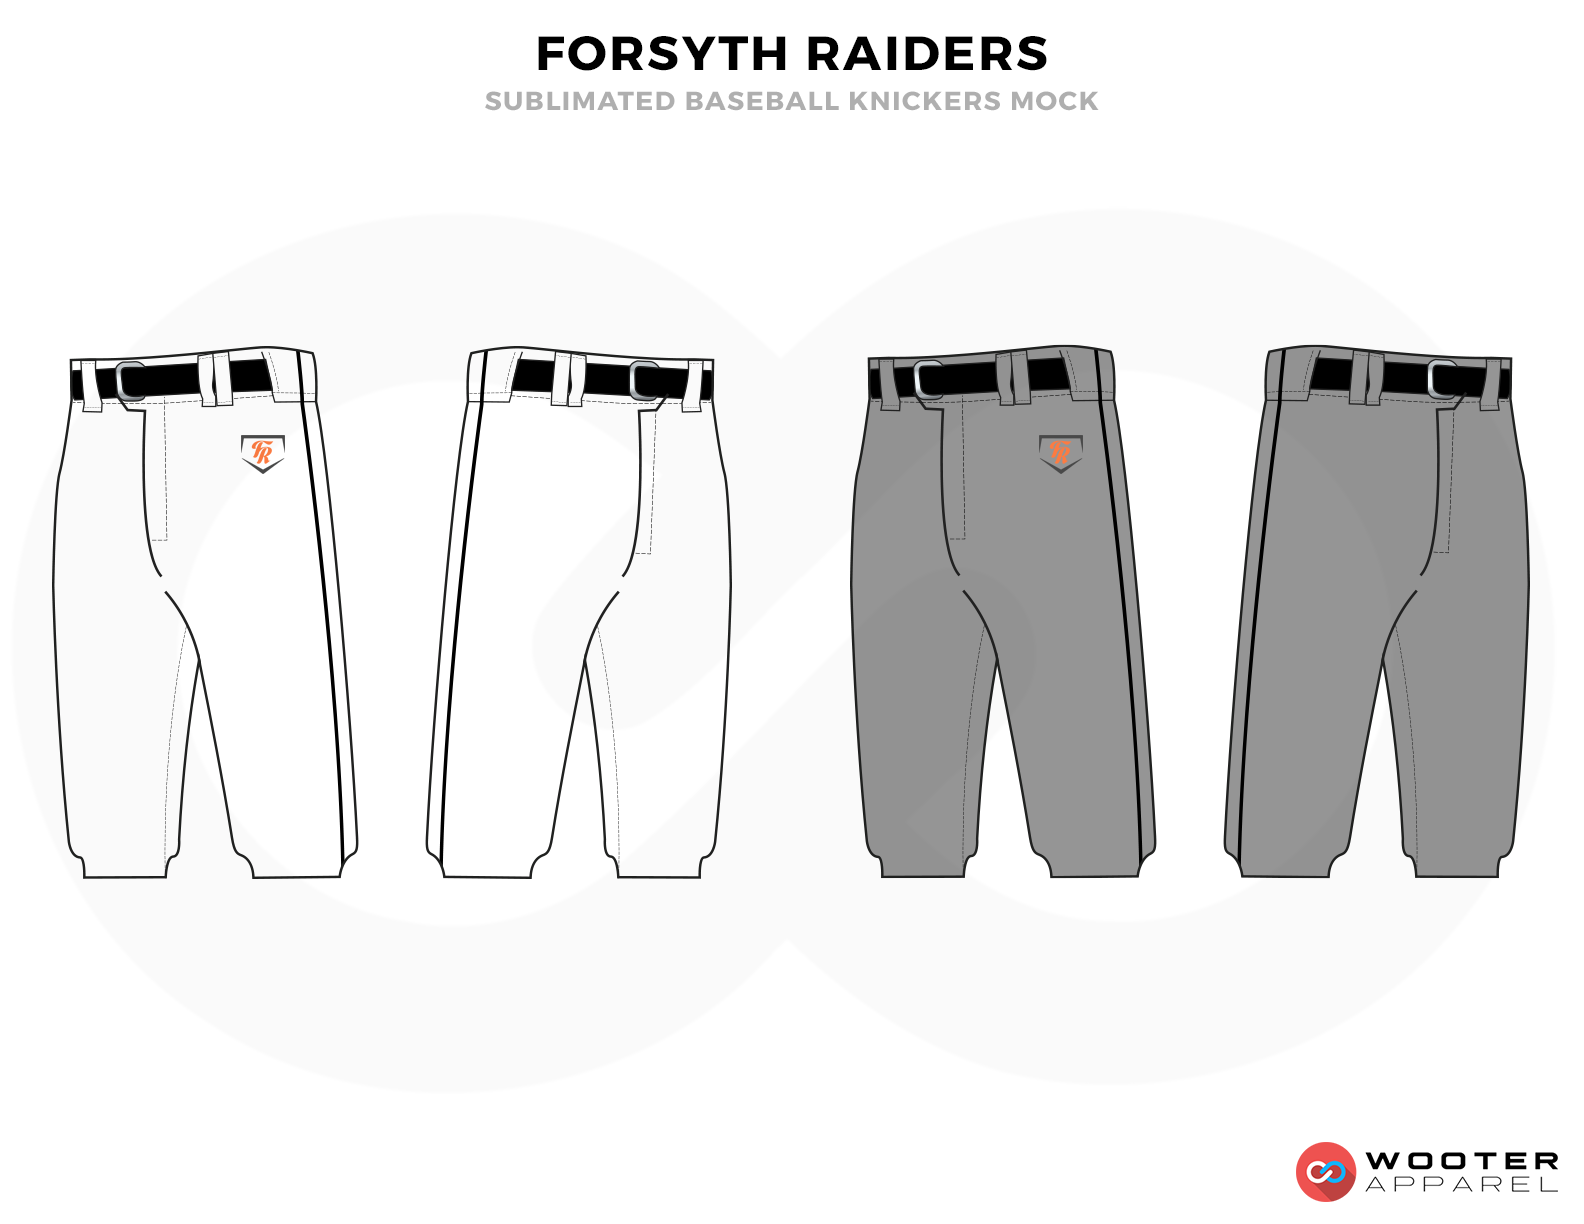 ForsythRaiders-BaseballUniform-Knickers-mock.png